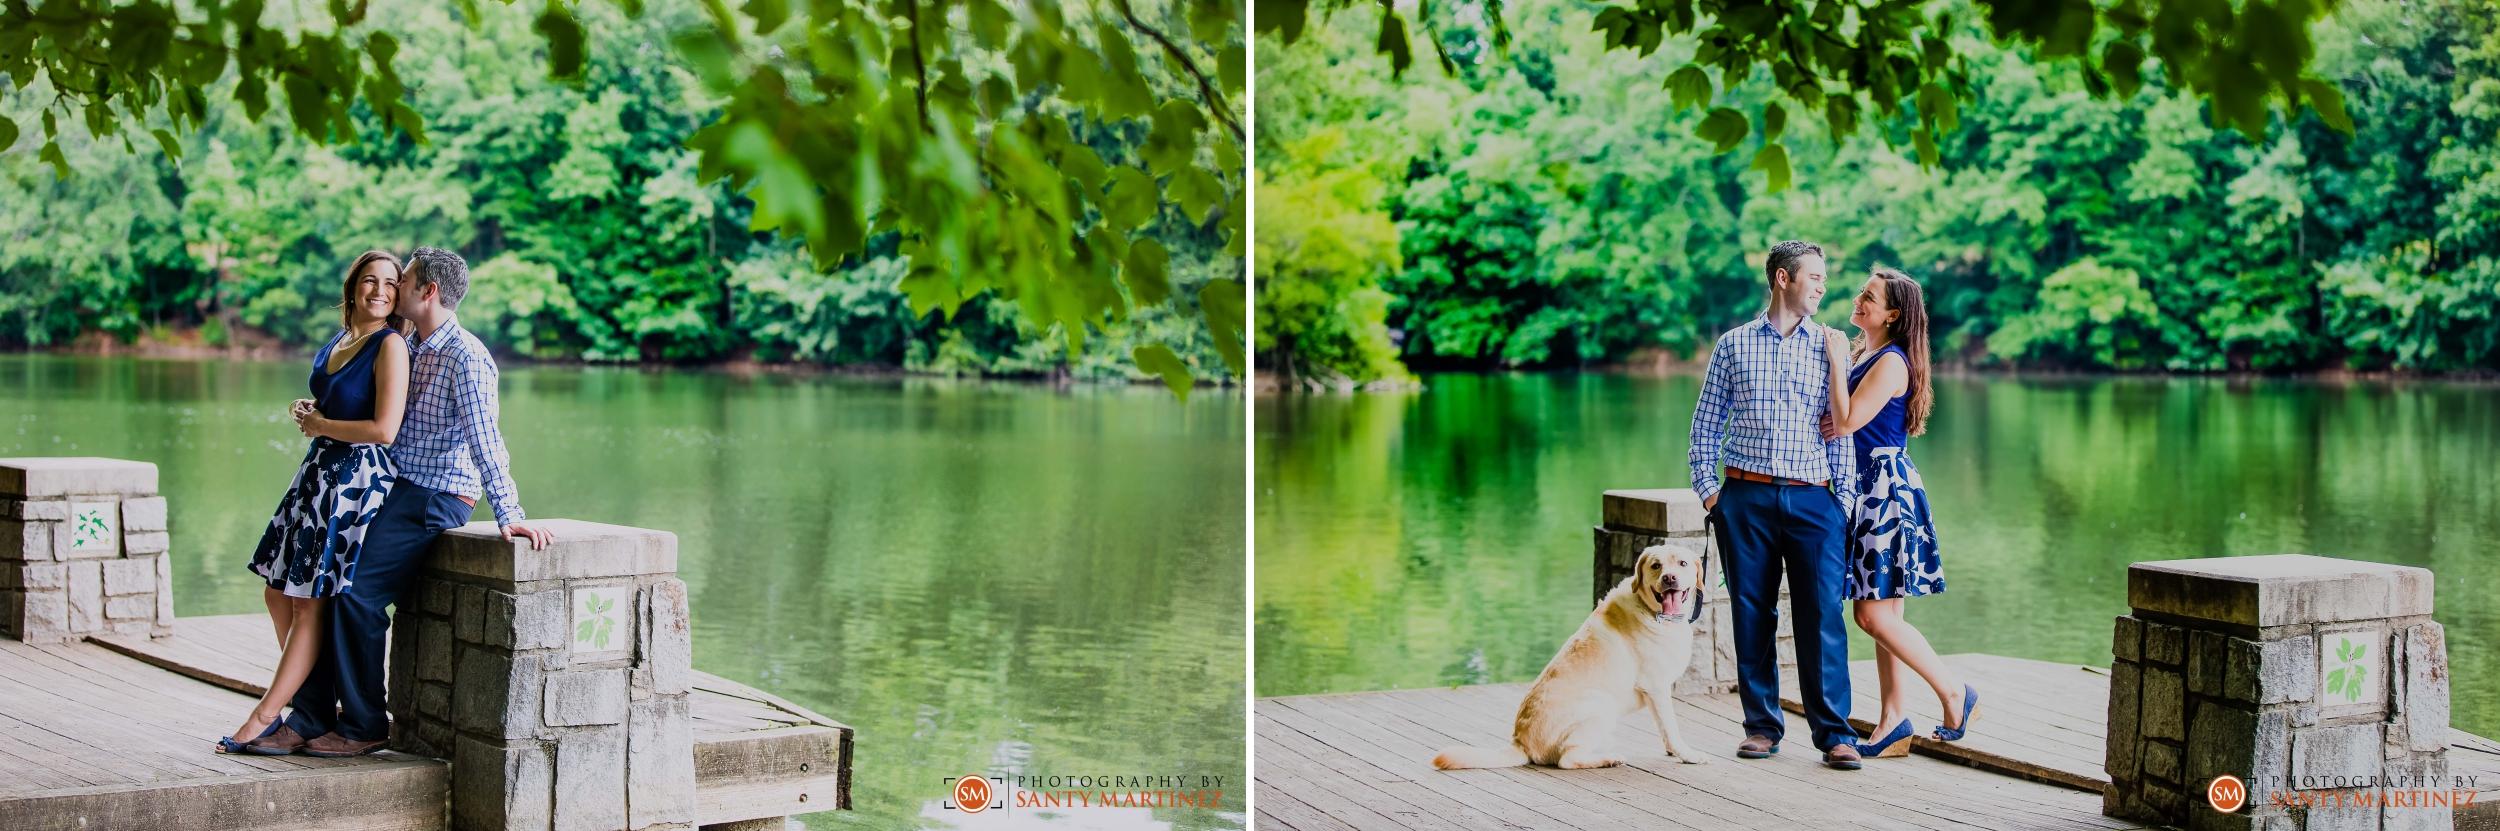 Engagement Session Piedmont Park - Santy Martinez Photography 8.jpg